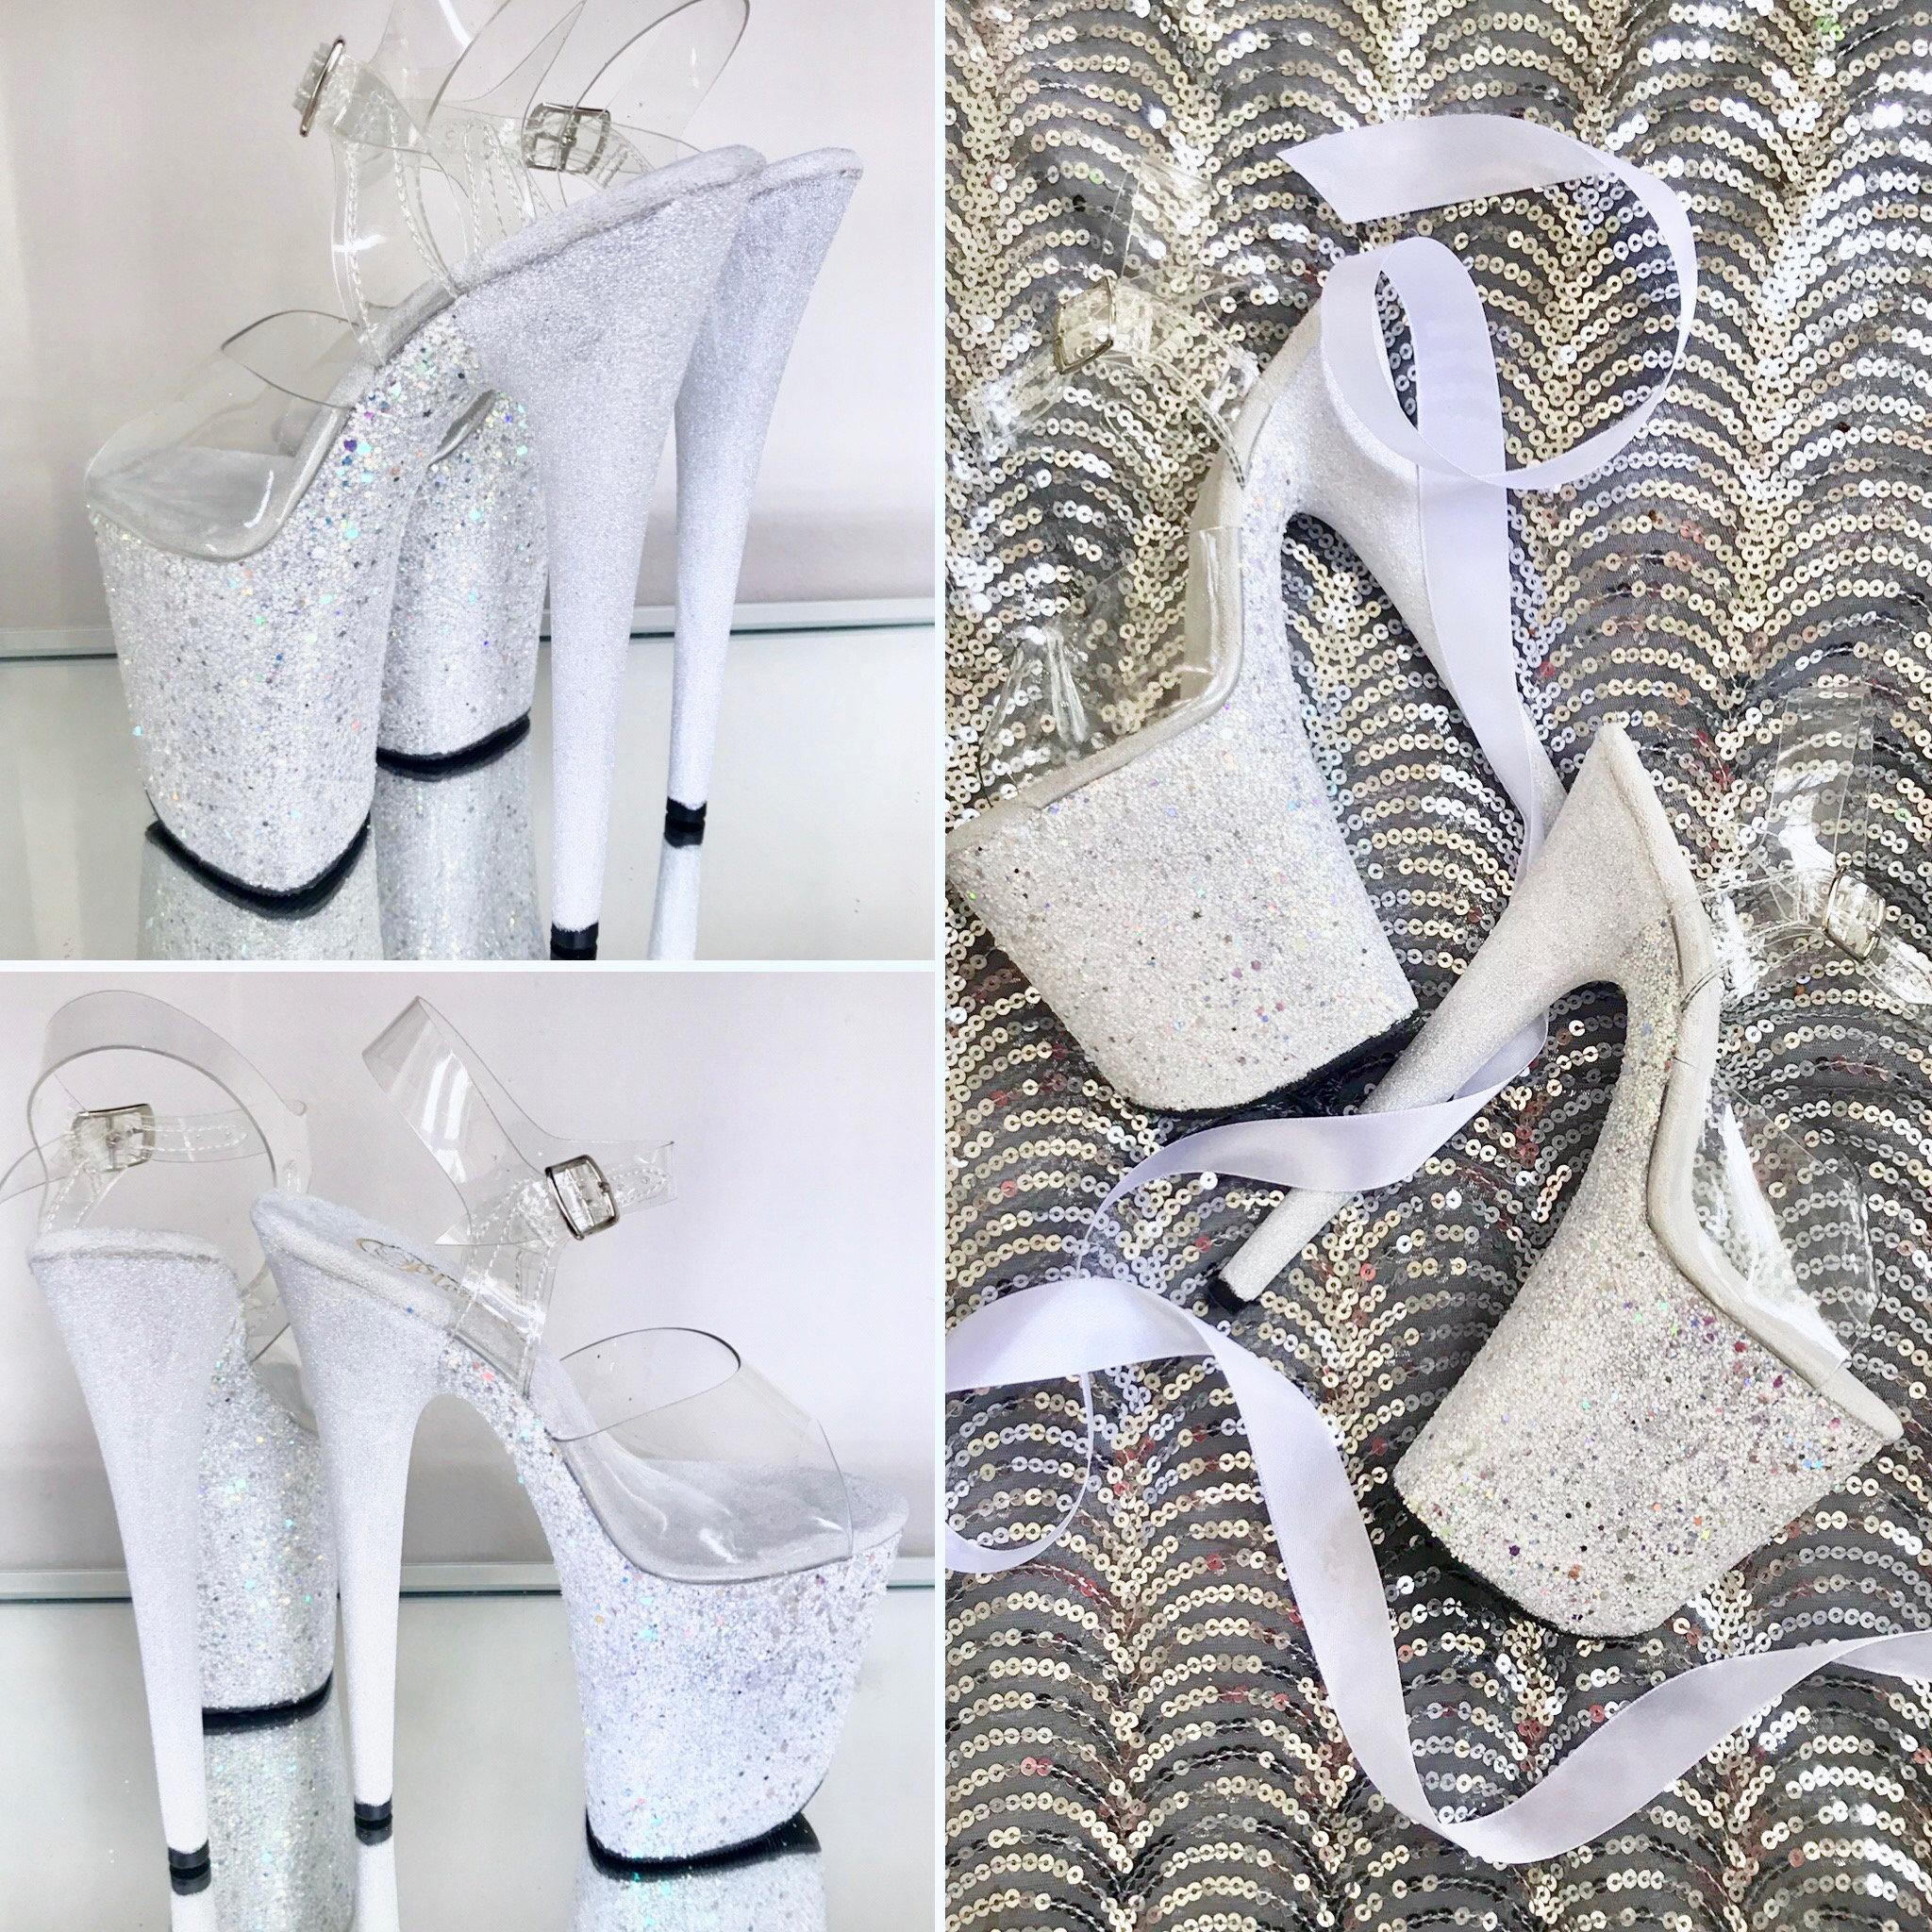 UK 7 Pleaser Detachable Ankle Straps for Stripper Heels 1 Pair S//M Fits UK 2